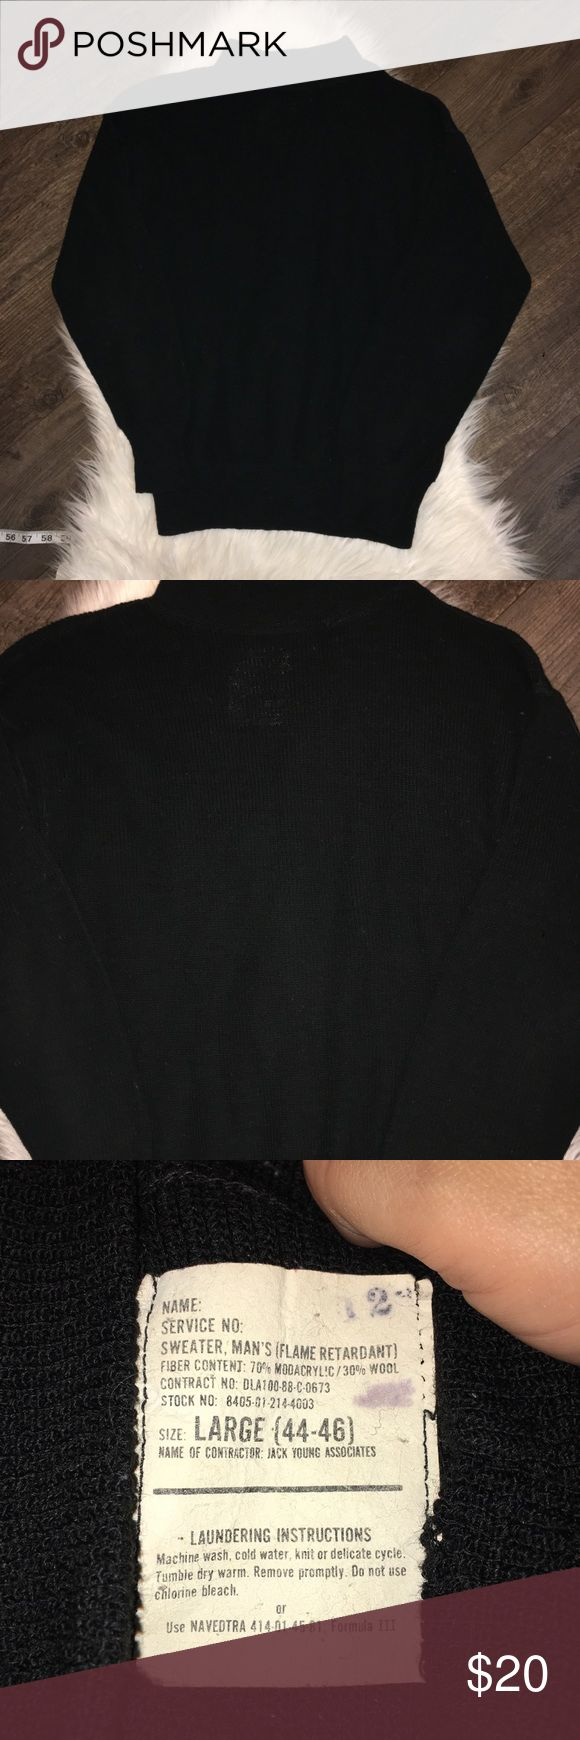 Vintage men's military issued sweater Vintage men's military issued sweater Great condition Vintage Sweaters Turtleneck